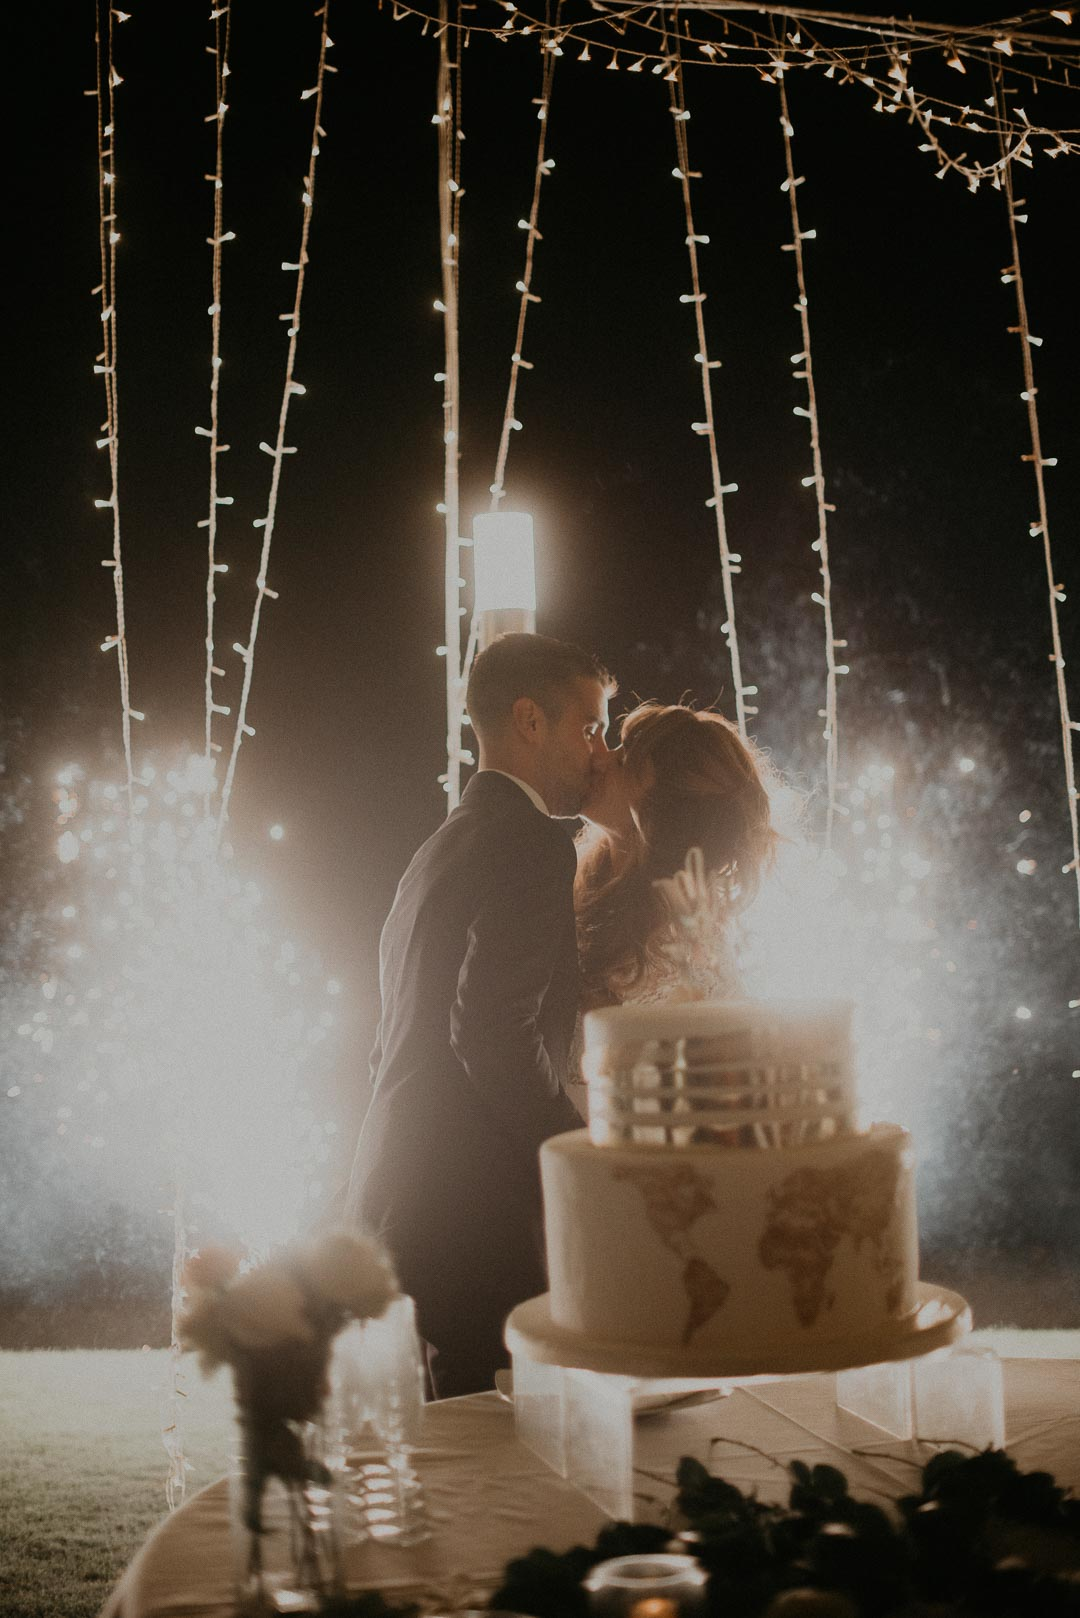 wedding-photographer-destination-fineart-bespoke-reportage-napoli-nabilah-vivianeizzo-spazio46-189